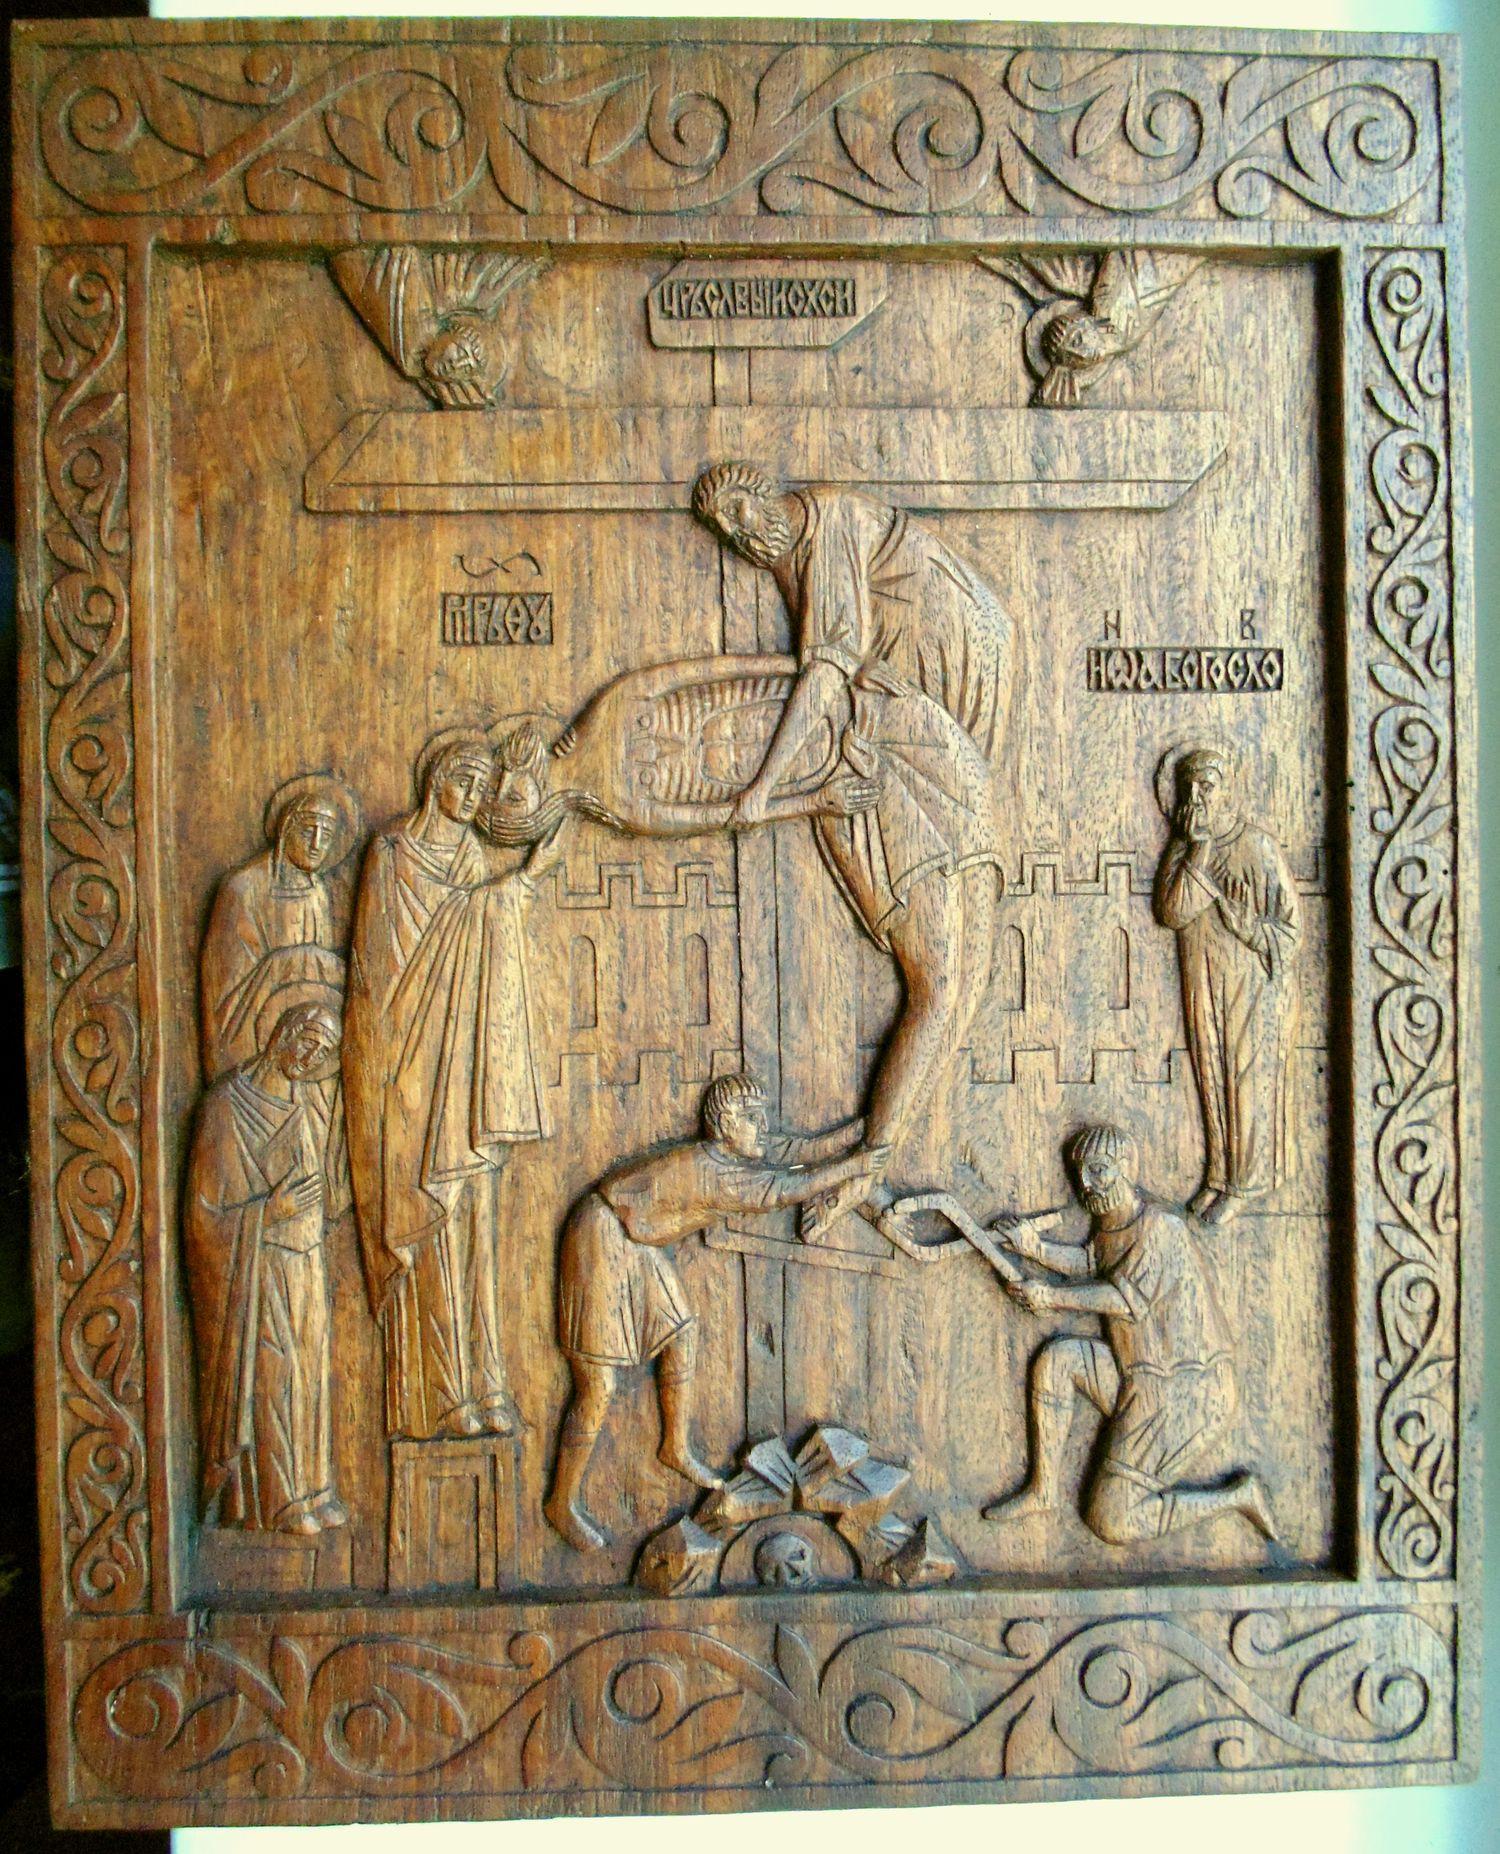 П.В.Алёшин. Снятие с креста (копия произведения XVII в.). Дерево (красное дерево), резьба.  22х24 см.